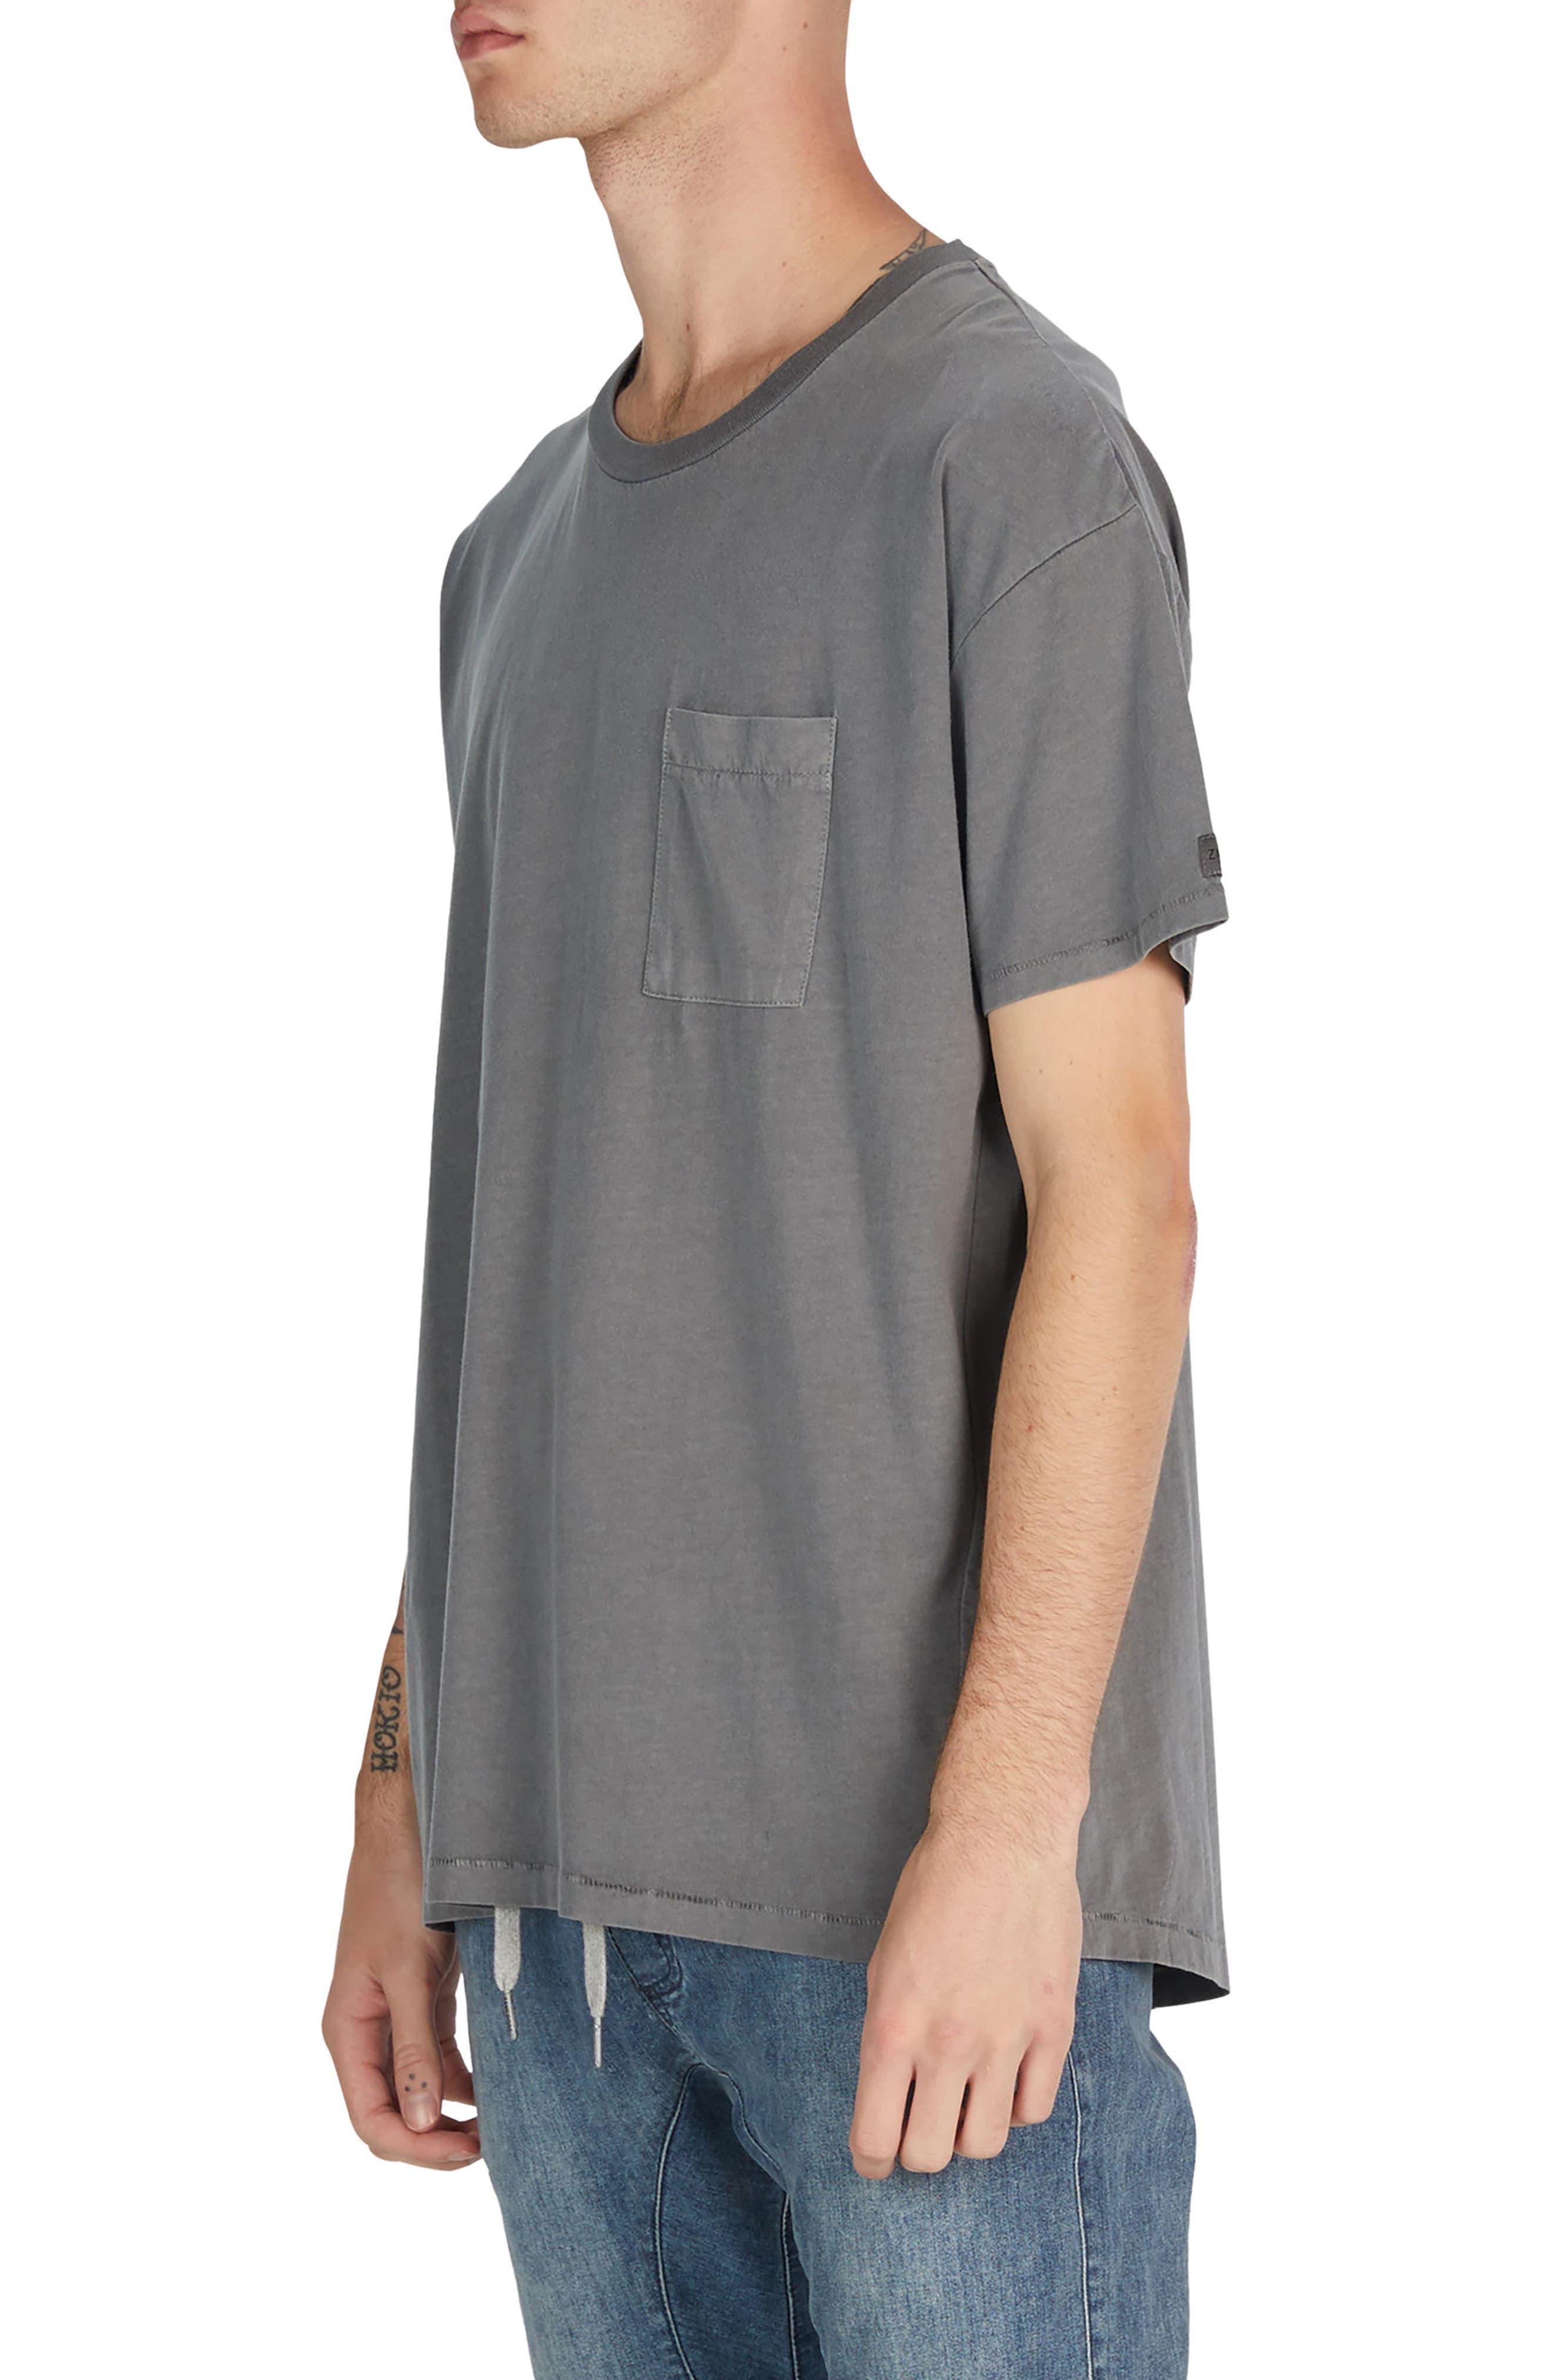 Rugger Pocket T-Shirt,                             Alternate thumbnail 4, color,                             029